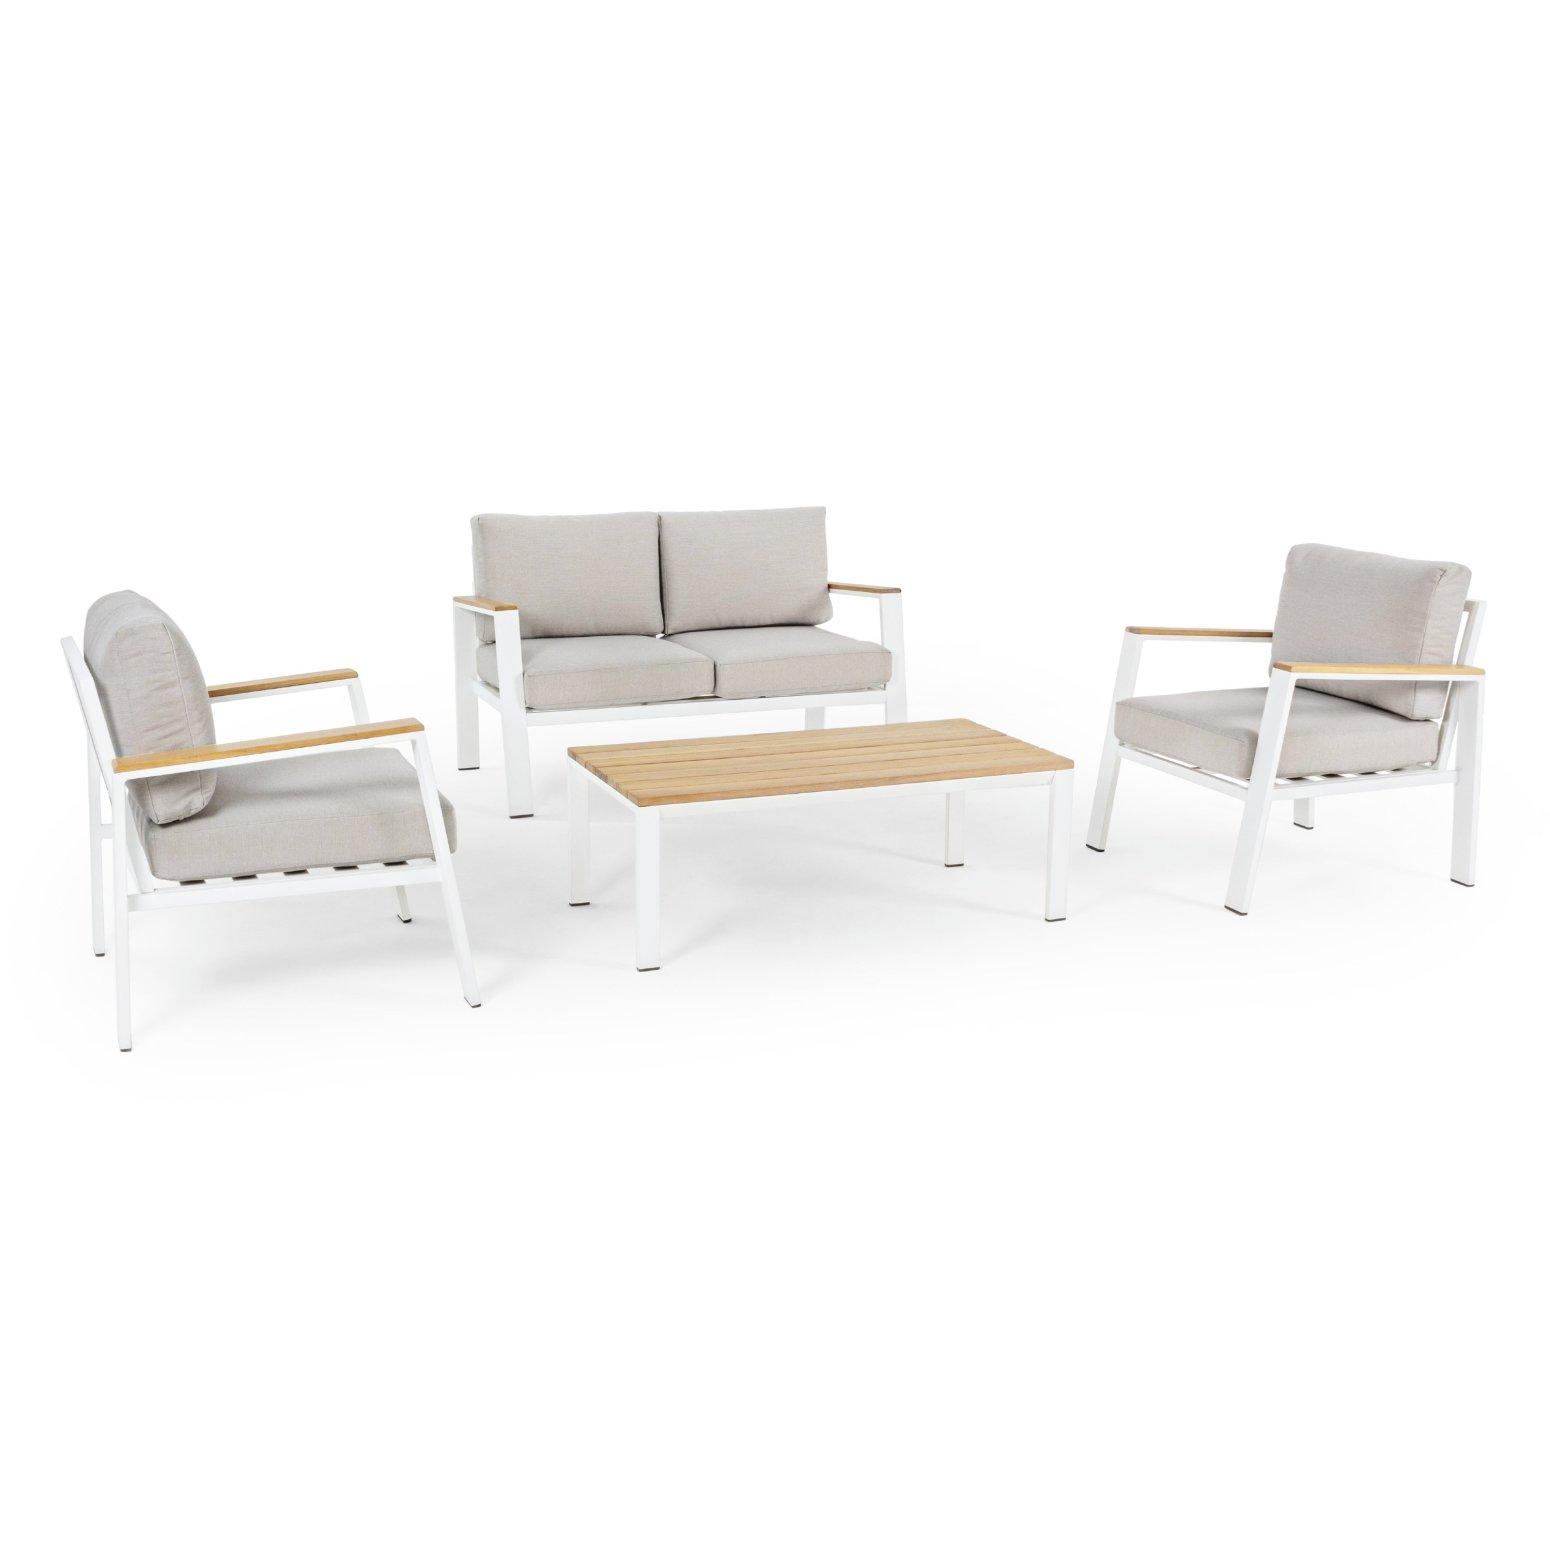 salon de jardin aluminium blanc et acacia 4 places